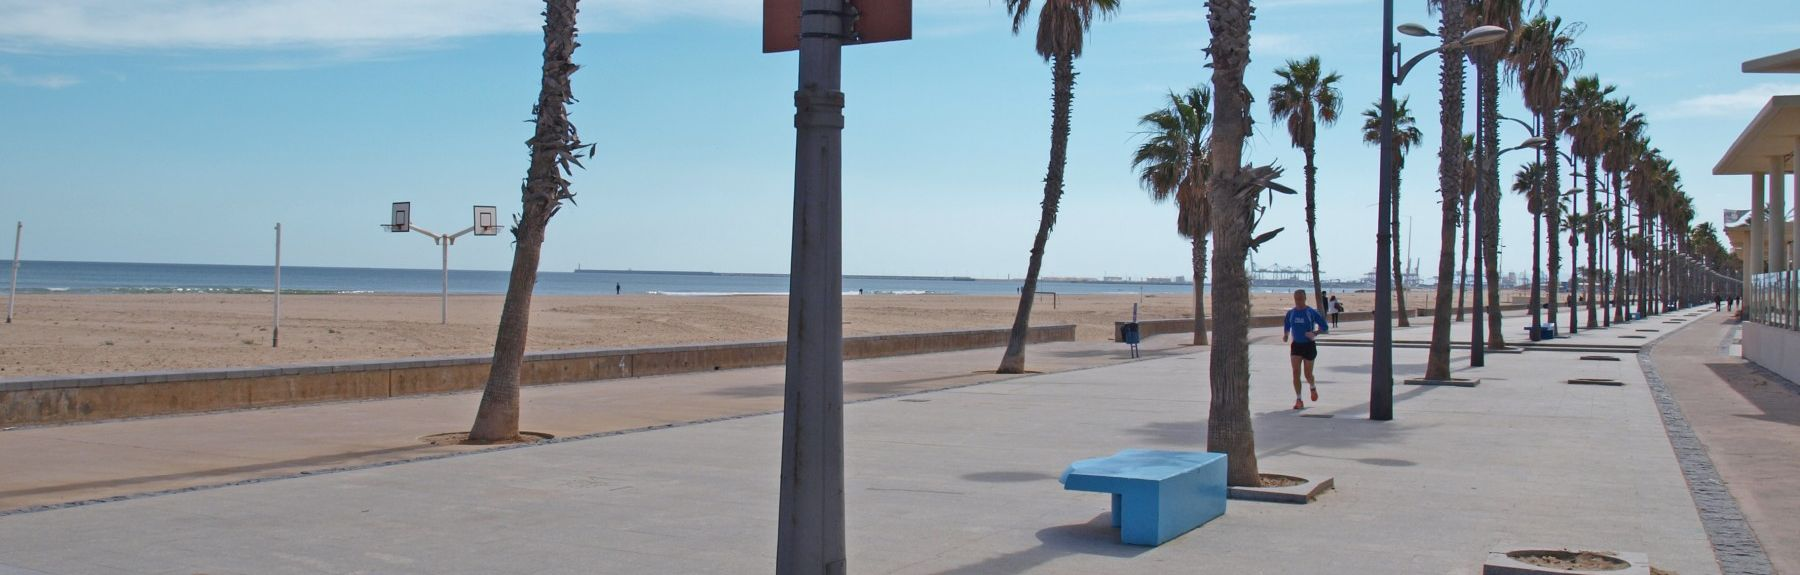 Godella, Valencia, Spain